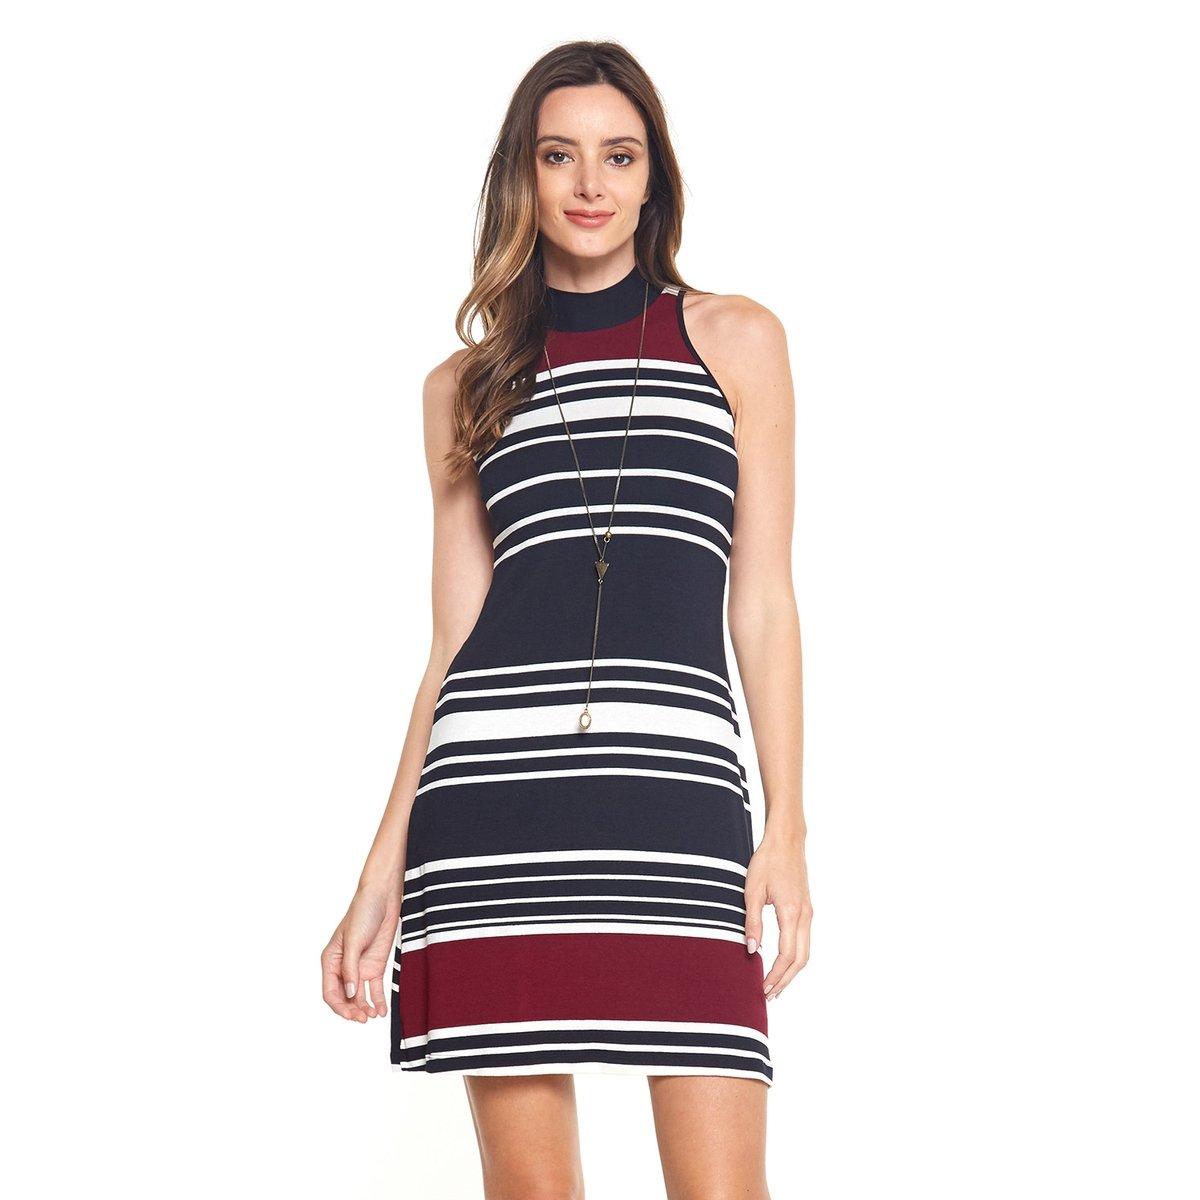 70dd117d57 Vestido Listras Casual - Compre Agora